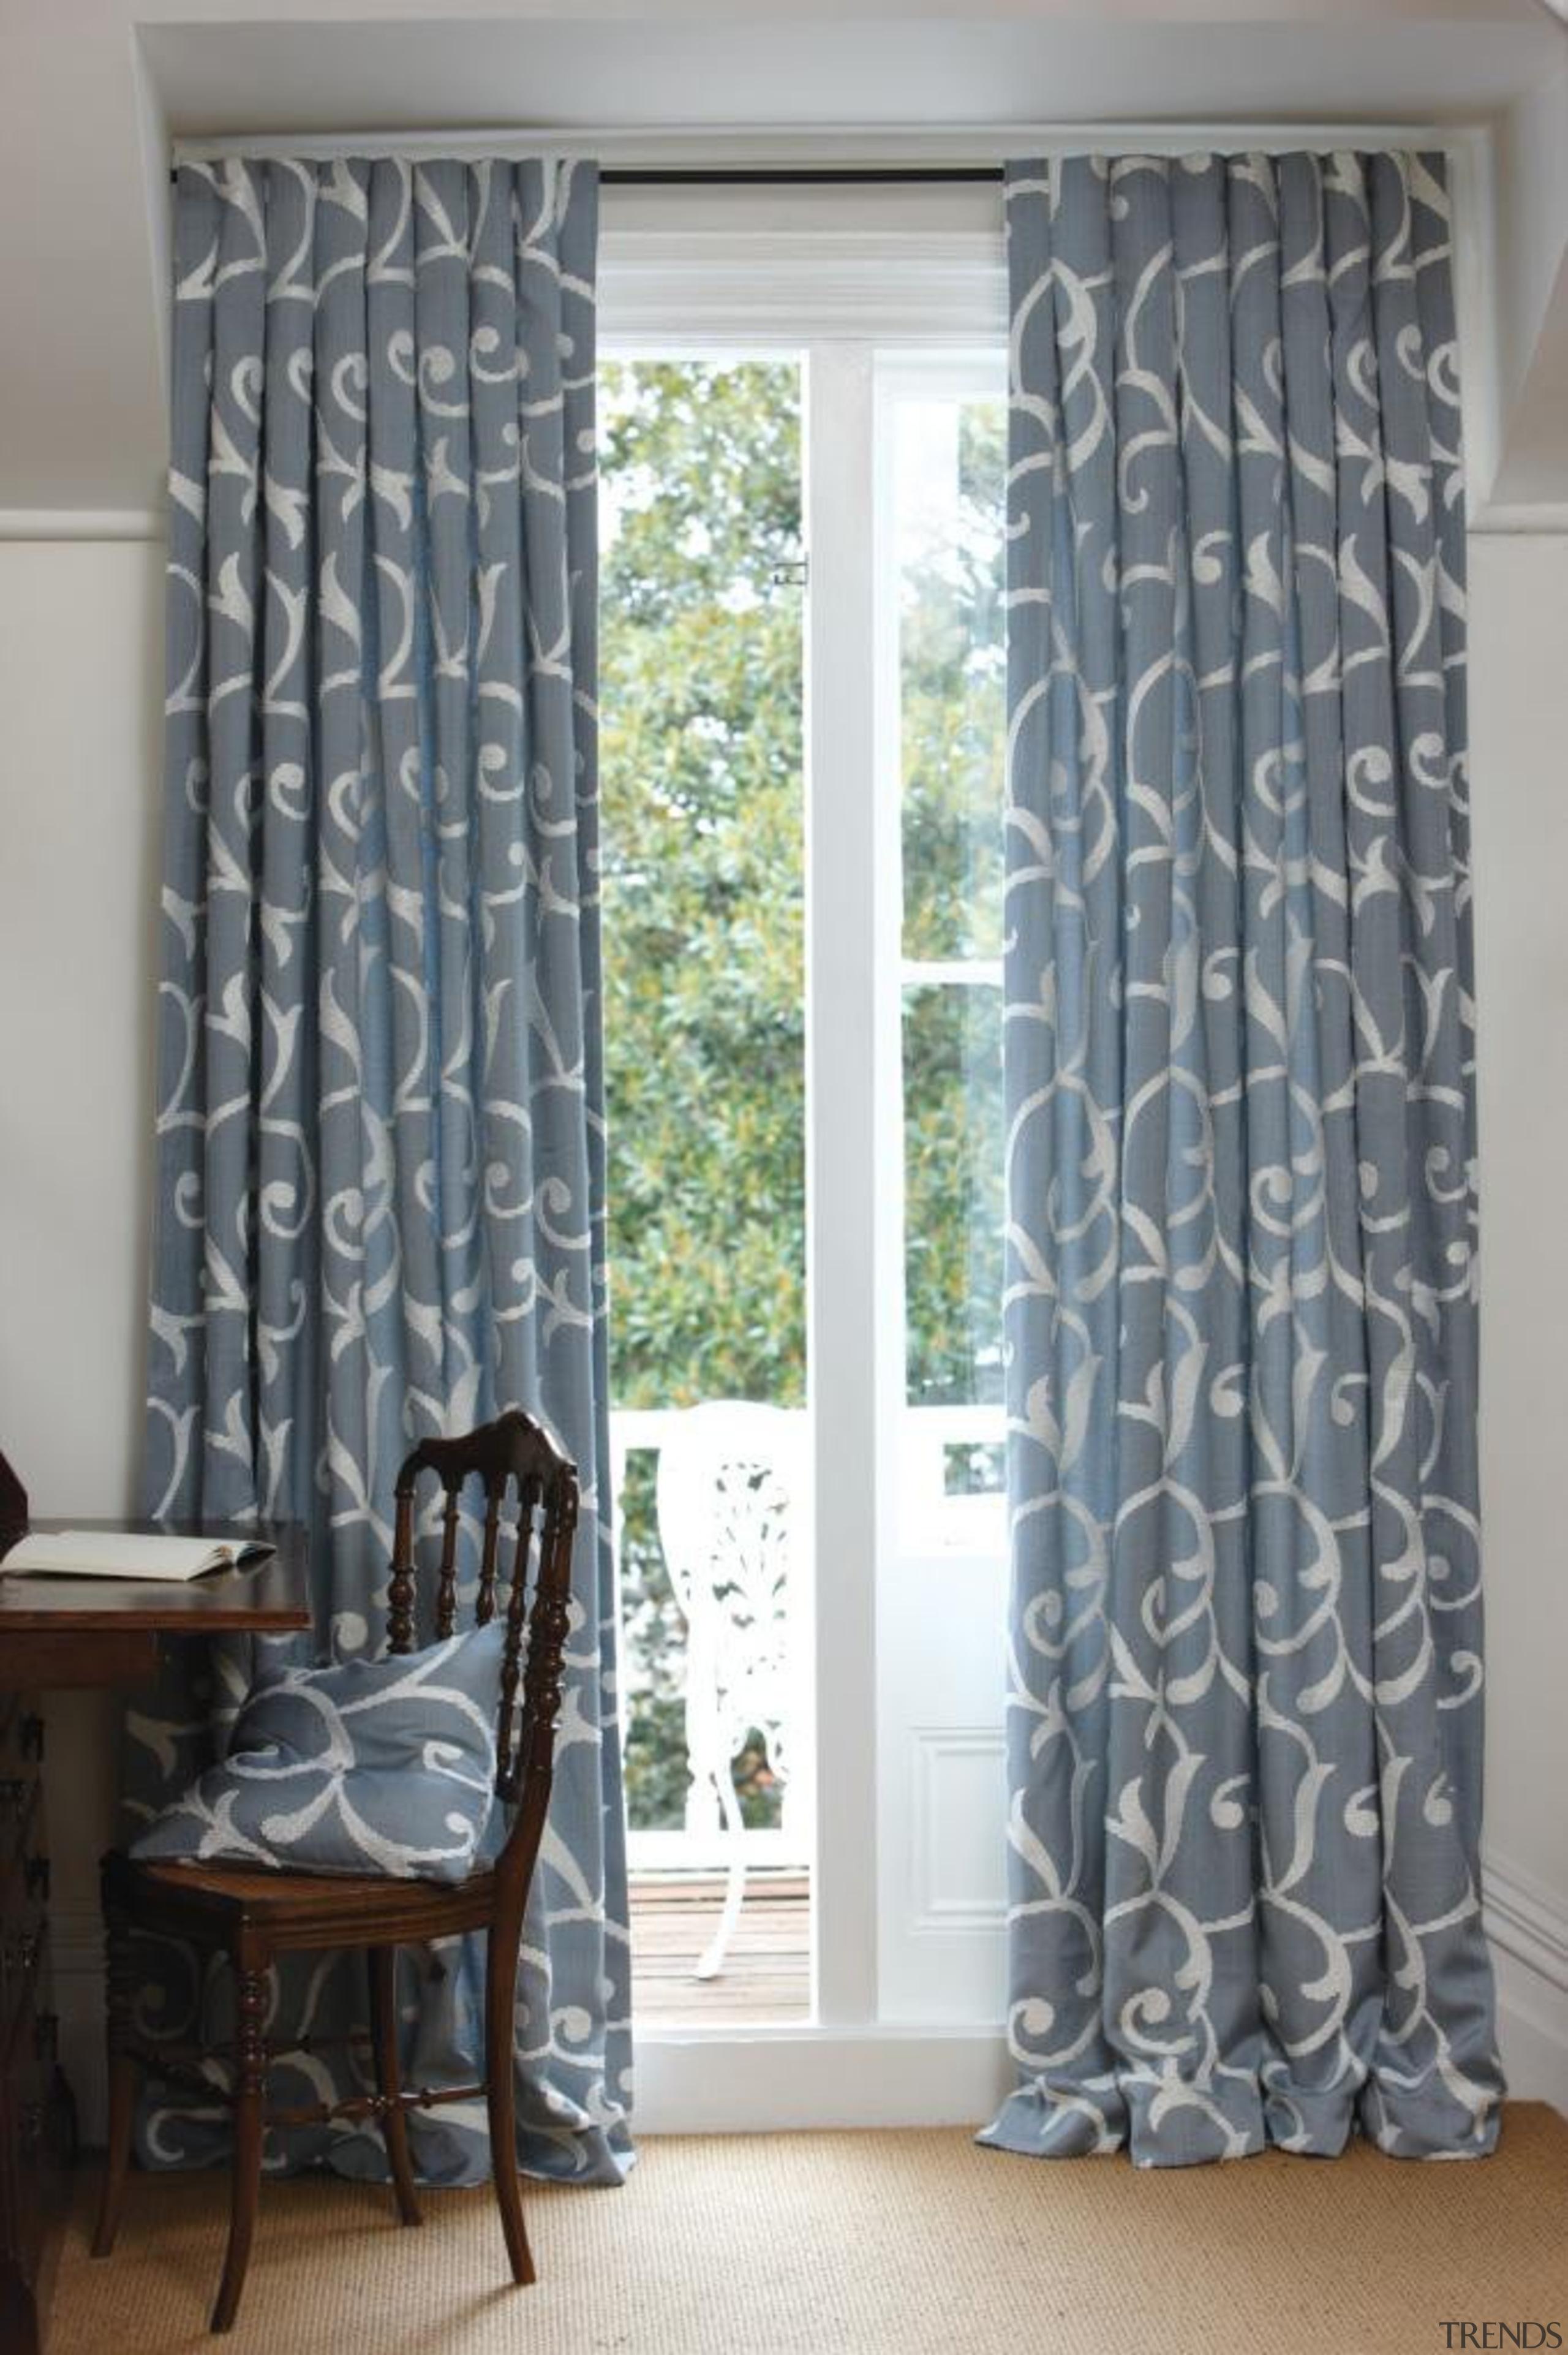 Sommerton - curtain   decor   home   curtain, decor, home, interior design, textile, window, window covering, window treatment, gray